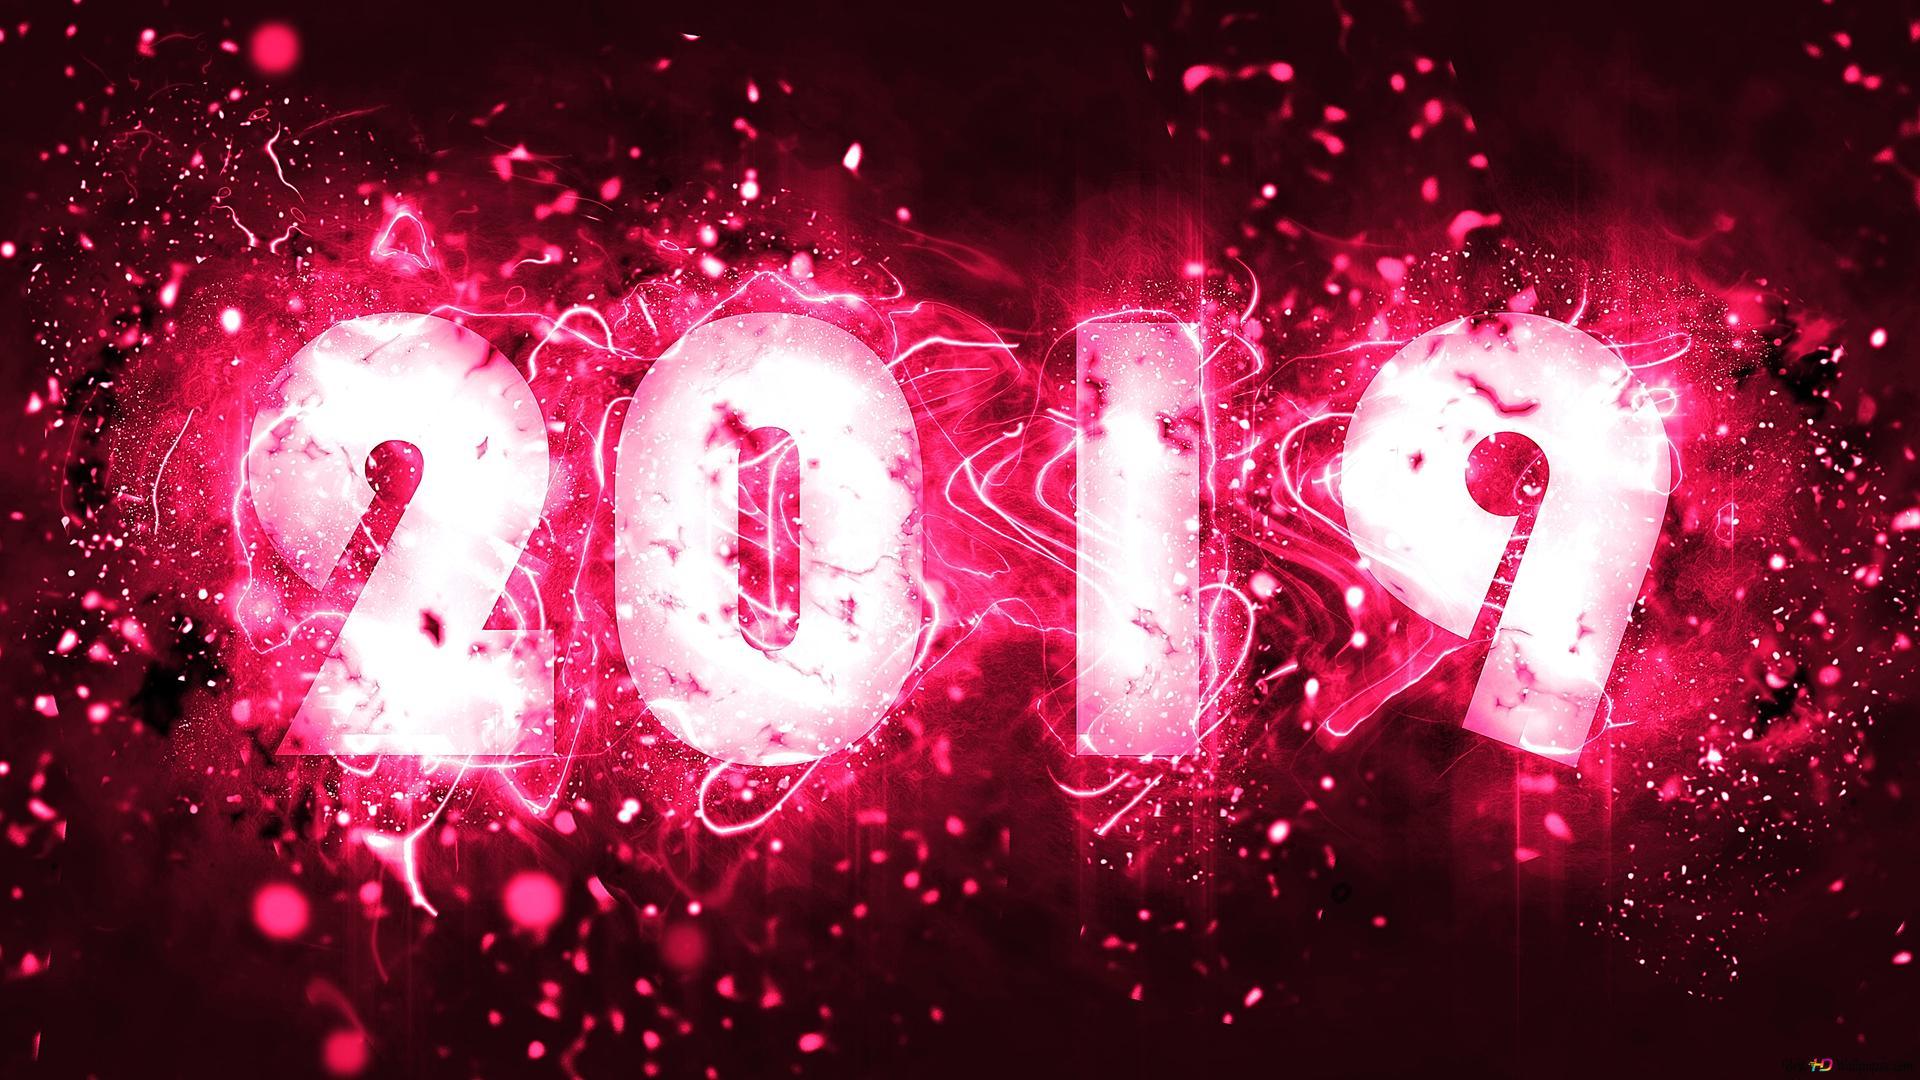 Happy flashing new year HD wallpaper download